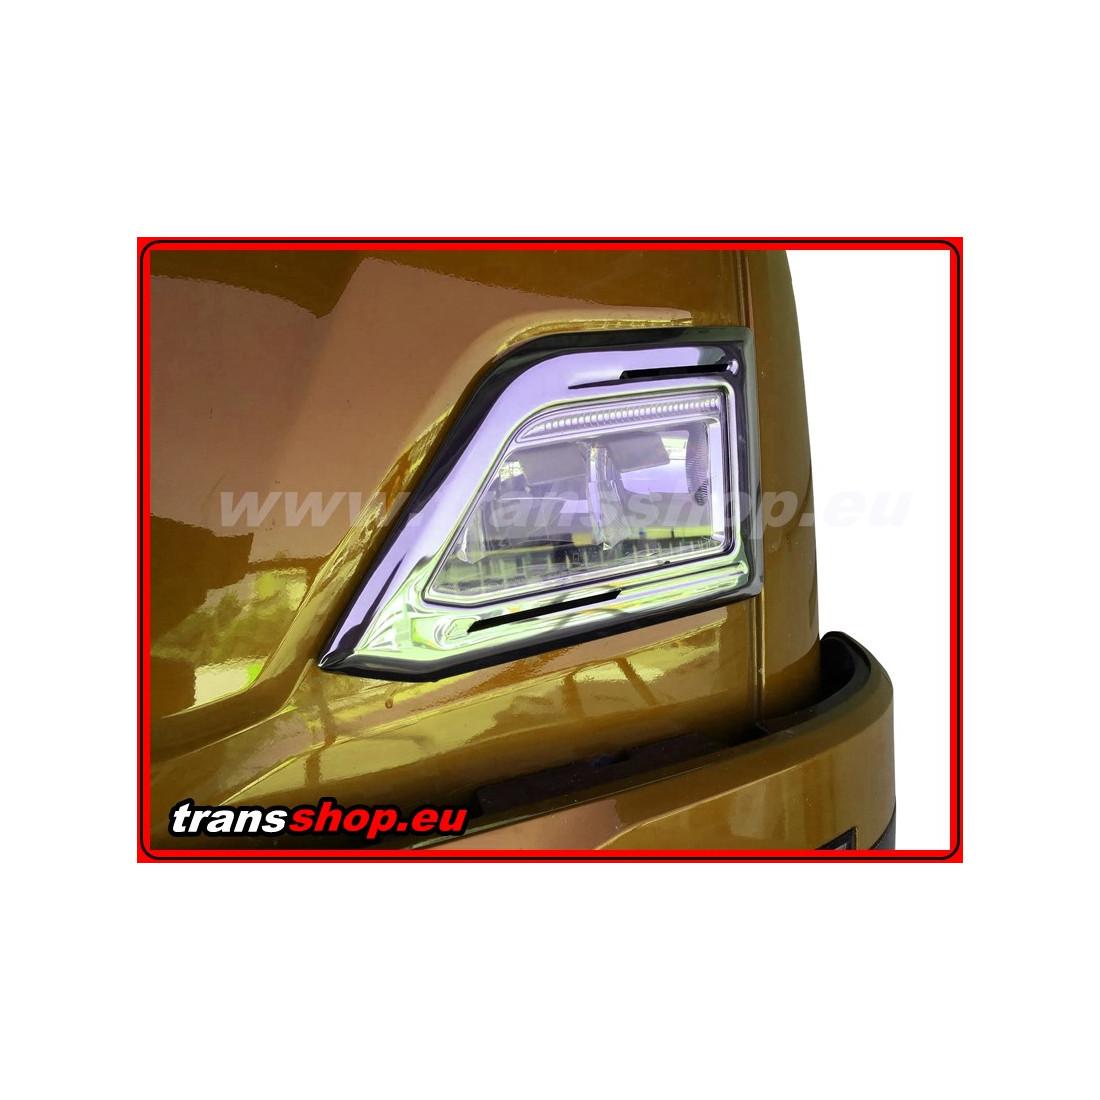 SCANIA S NG Edelstahl 3D Dekor Top Scheinwerfer Abdeckung